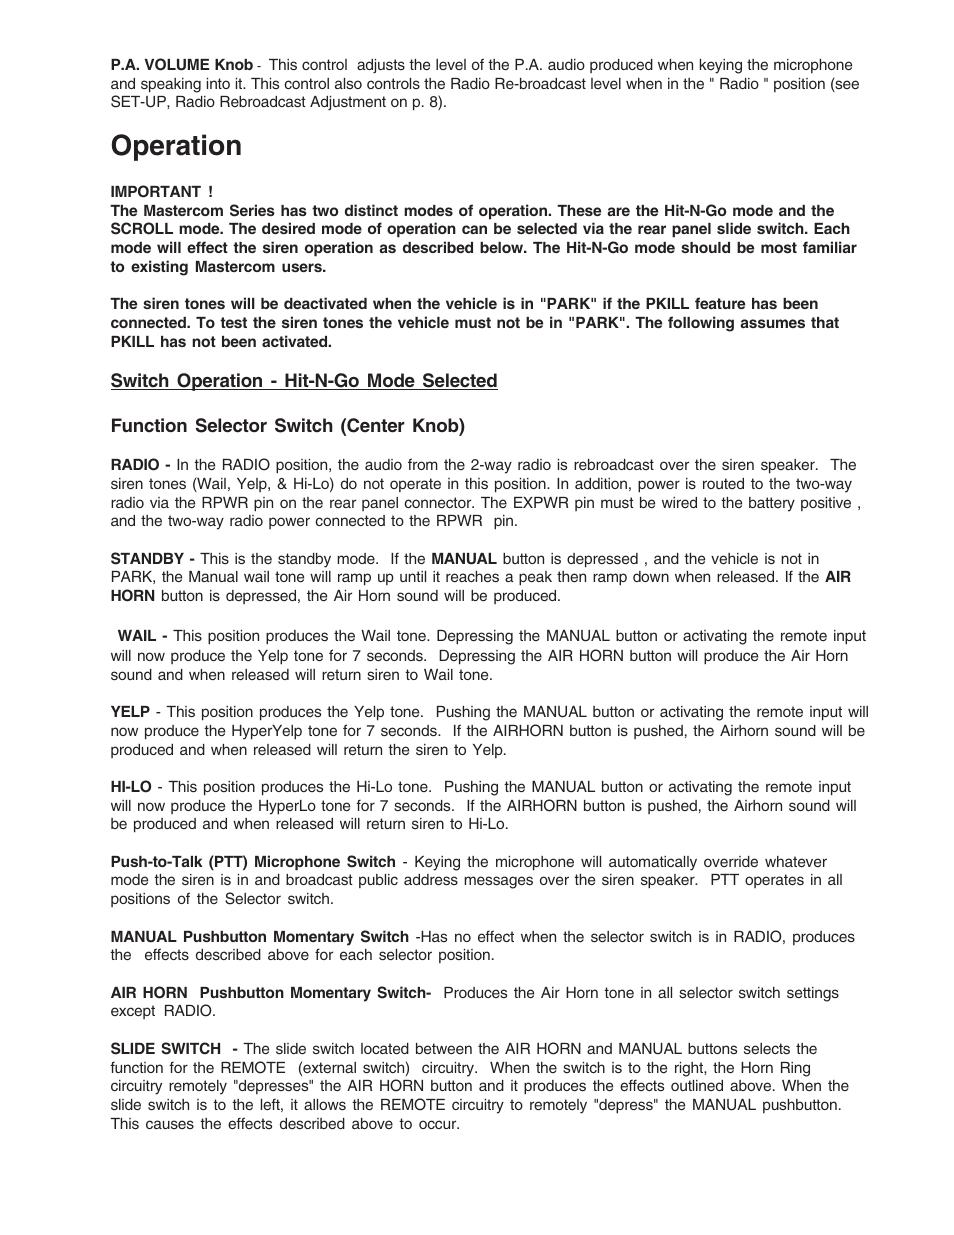 Operation | Code 3 MasterCom B Series User Manual | Page 11 / 26